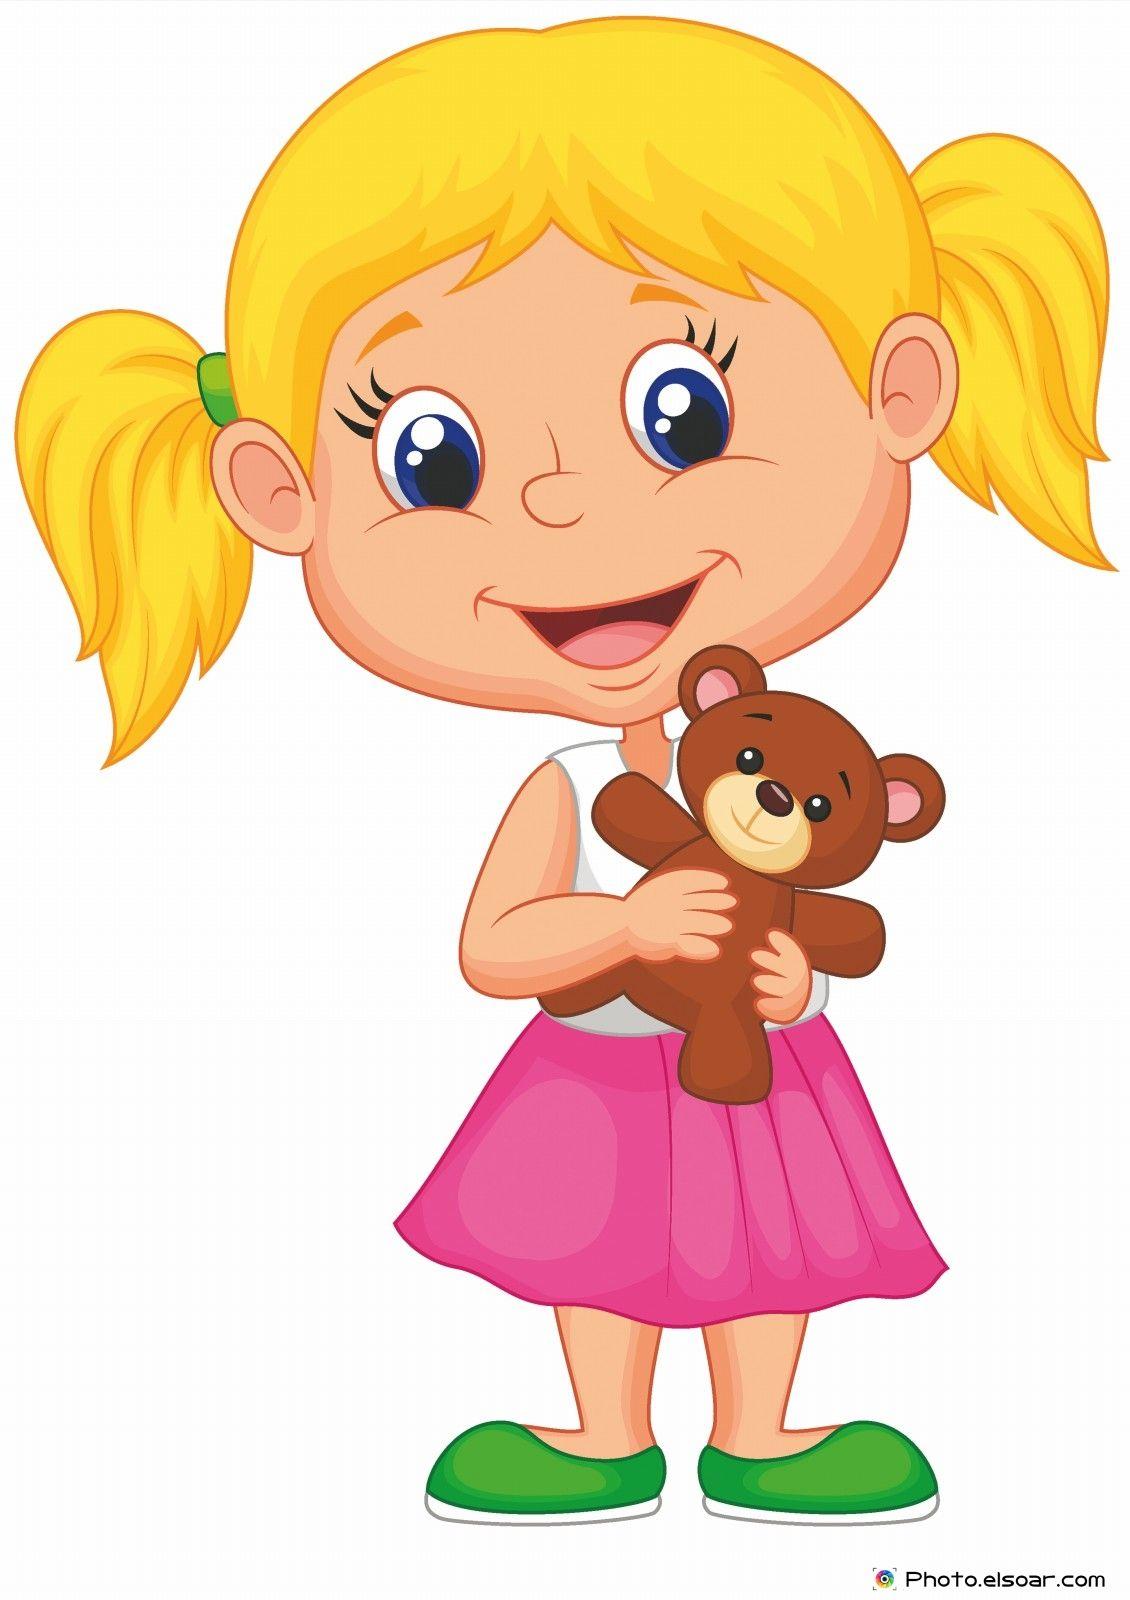 Little girl cartoon clipart jpg library 15 Funny Cartoon Kids Pictures • Elsoar | Cartoon | Little girl ... jpg library